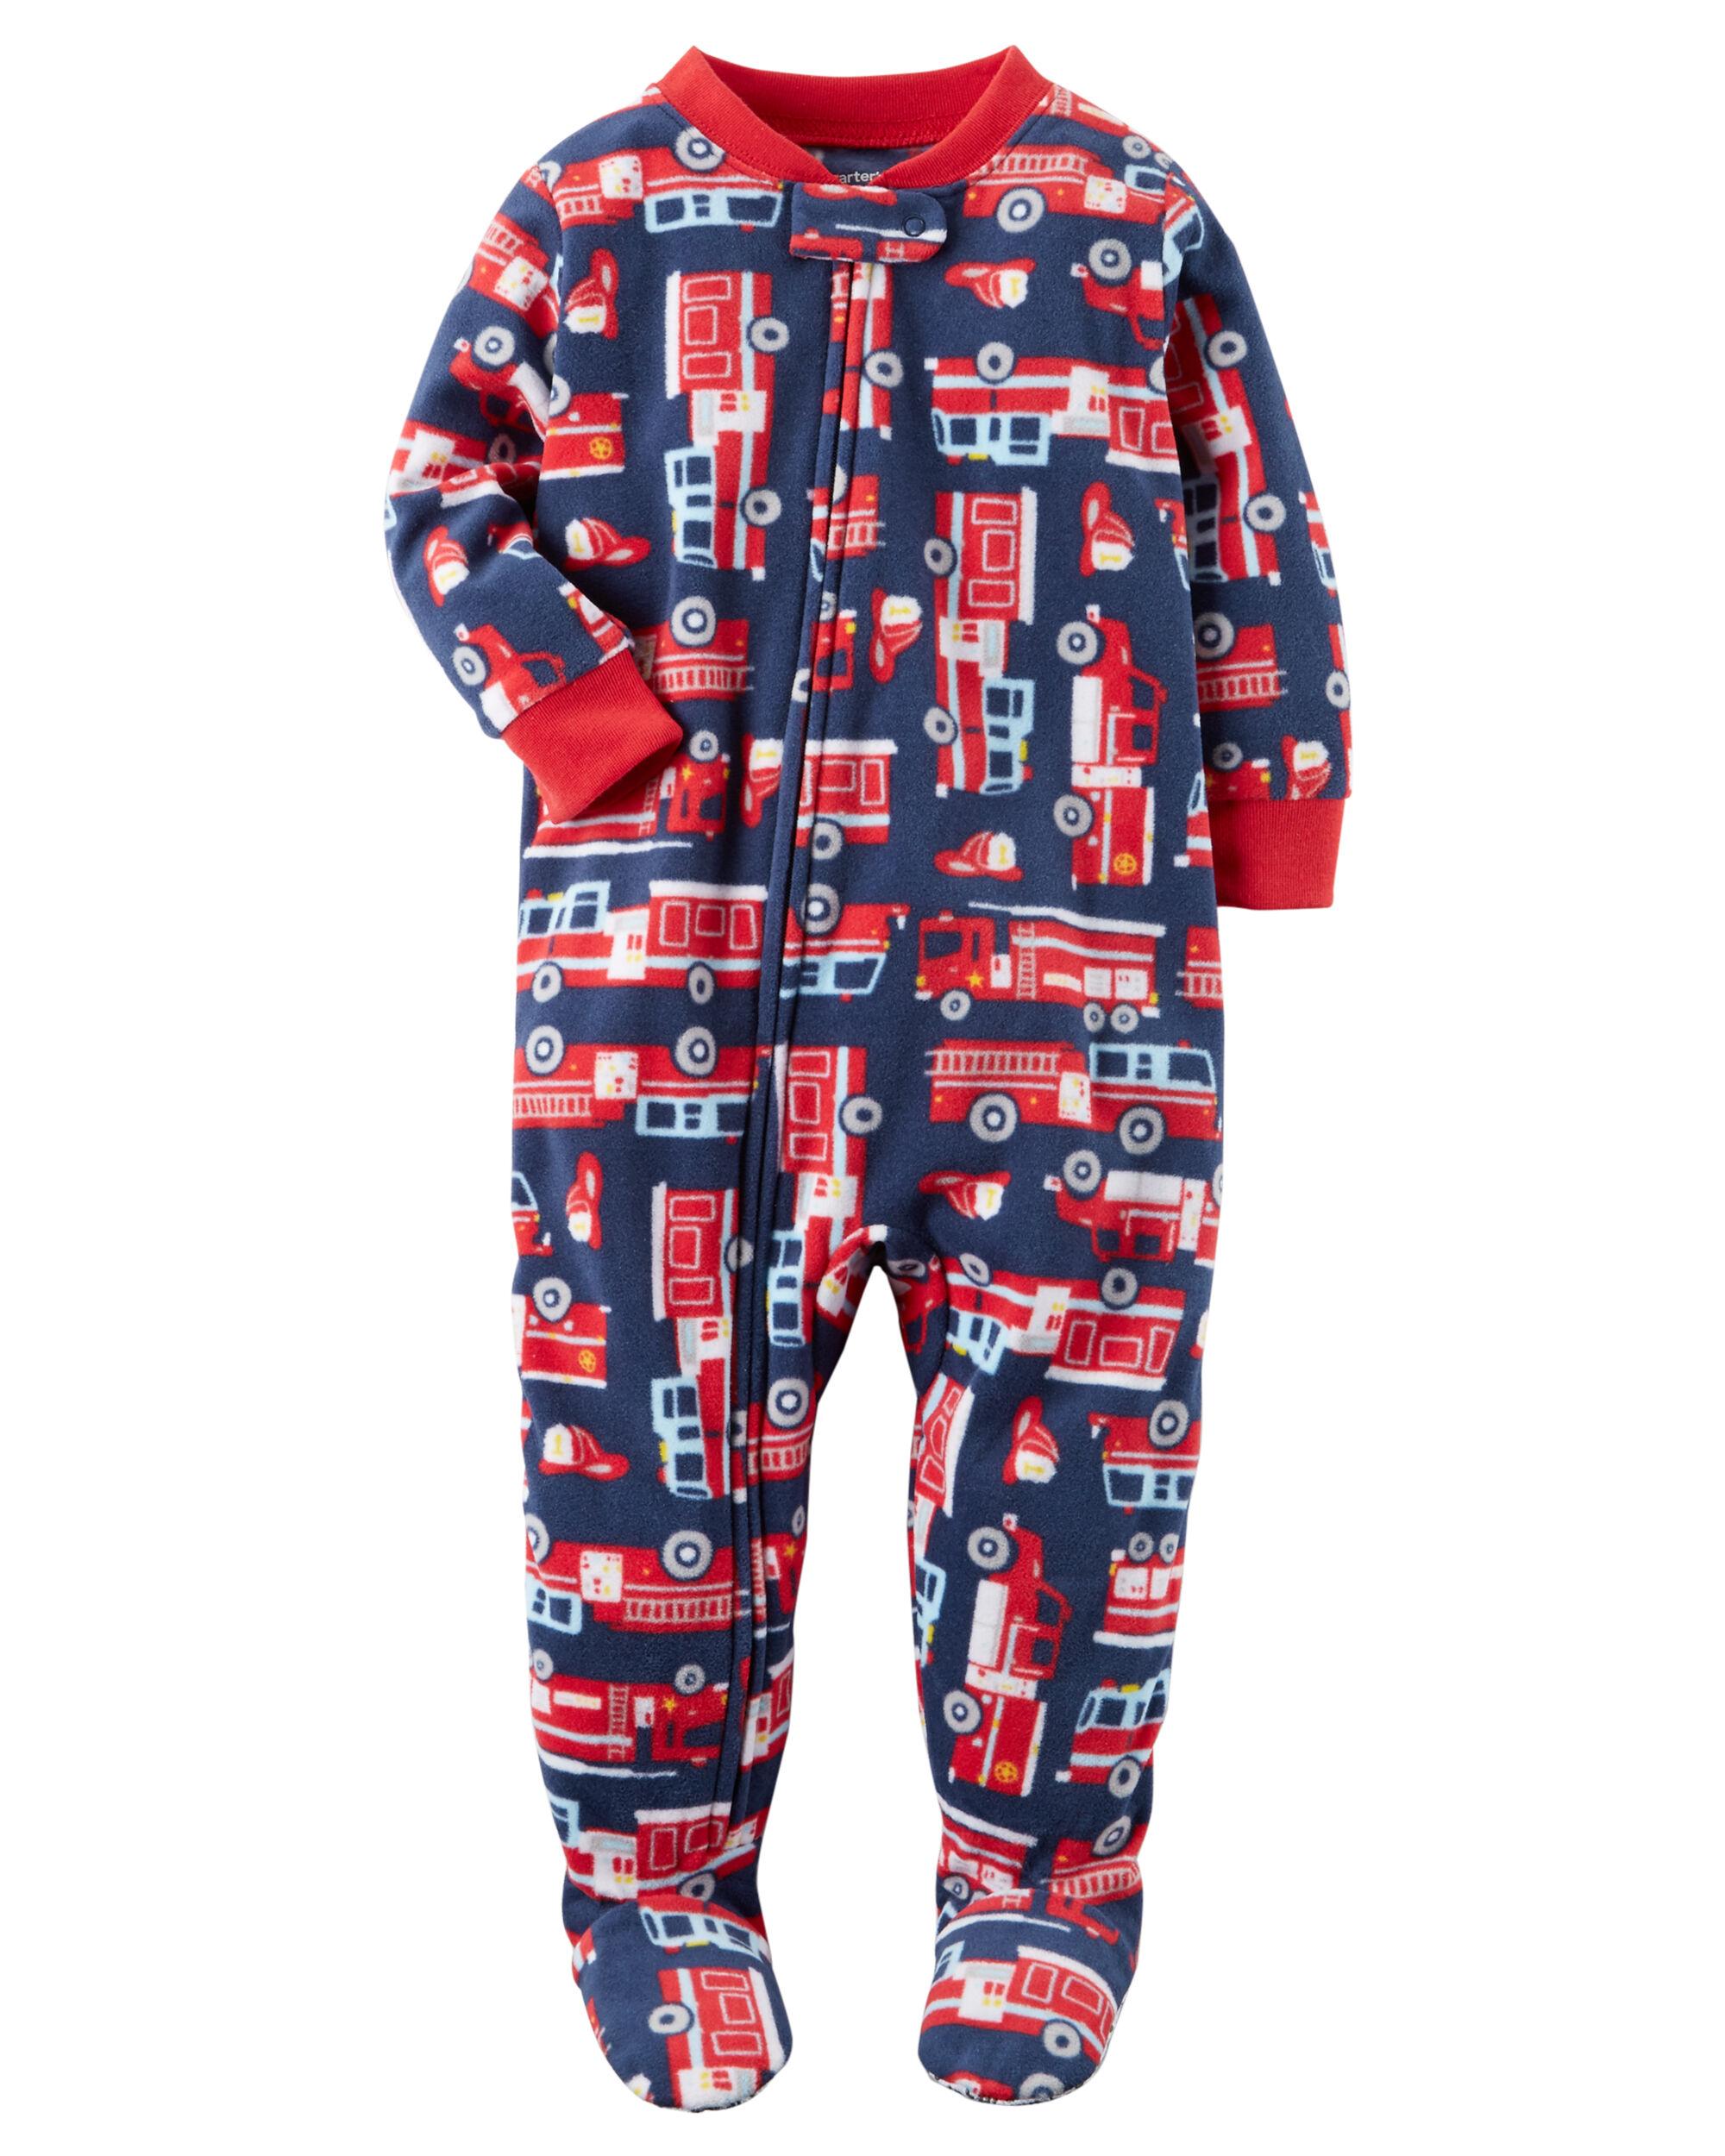 boys pajamas pj s sleepwear carter s shipping 1 piece firetruck fleece pjs